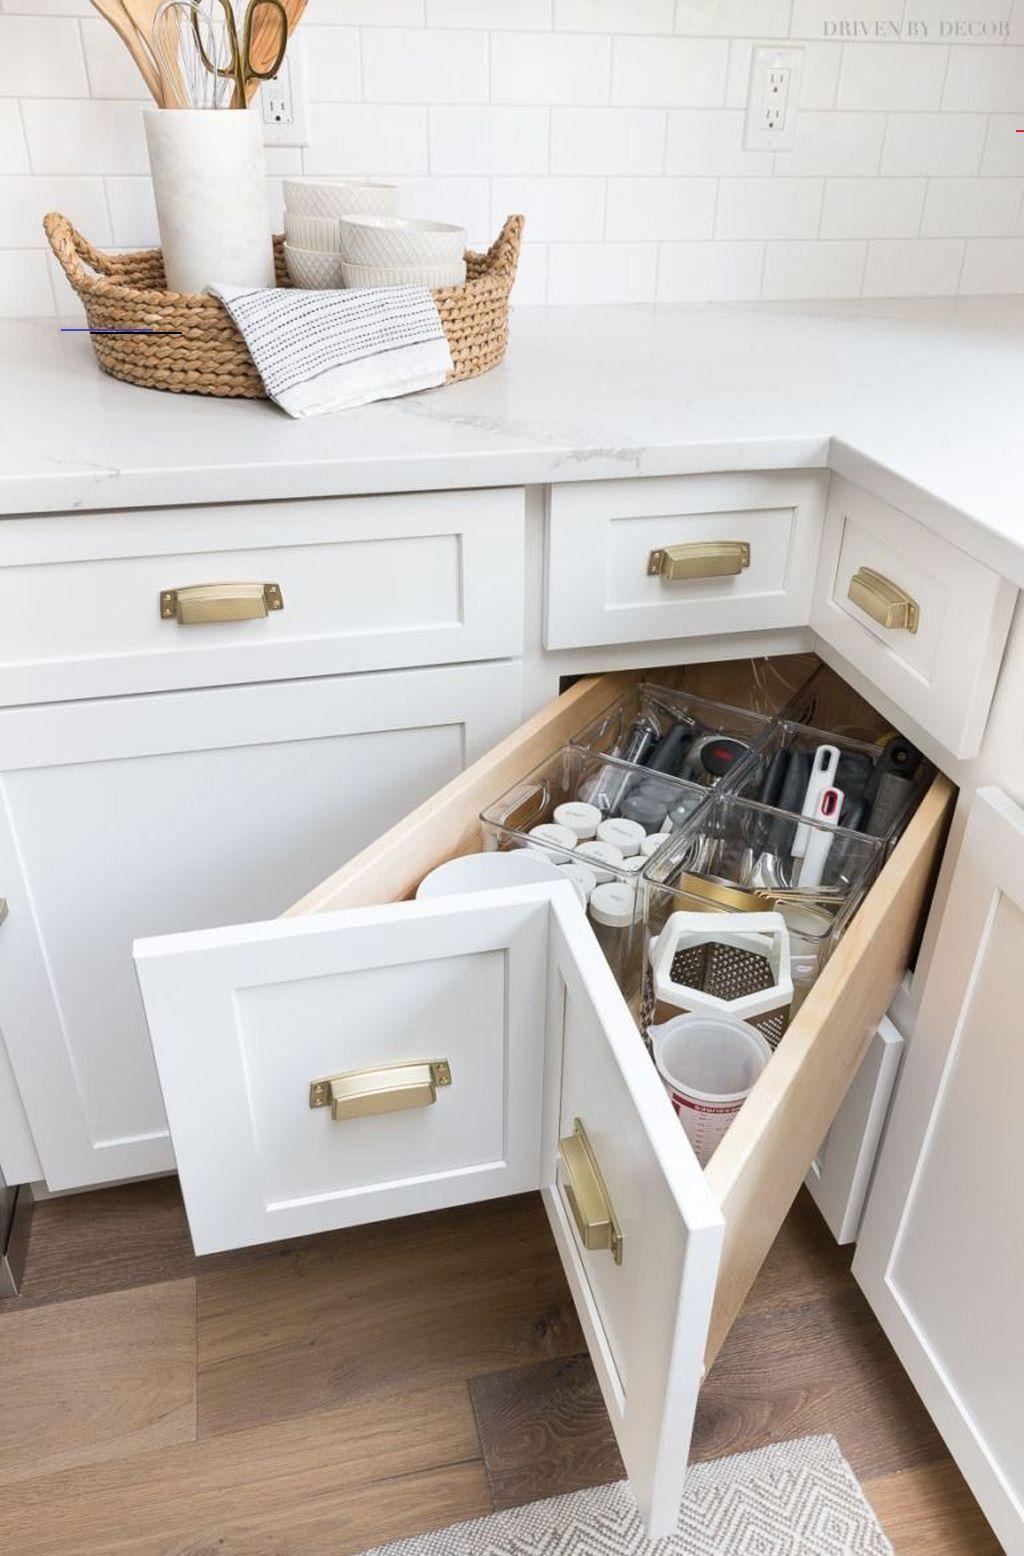 49 elegant small kitchen ideas remodel smallkitchendesigns in 2020 small kitchen storage on kitchen organization elegant id=56029